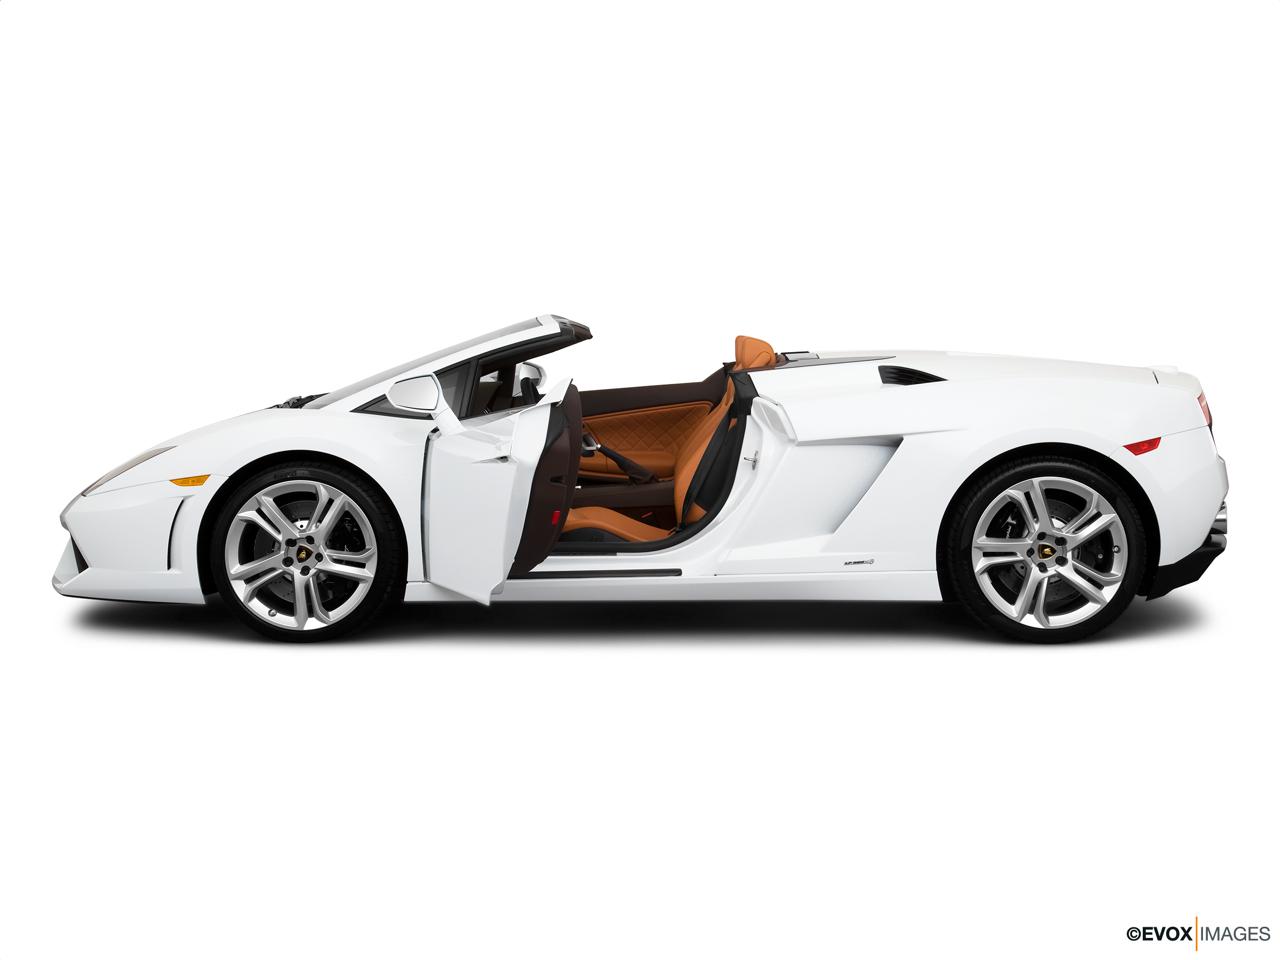 2014 Lamborghini Gallardo Convertible Lp560 4 Spyder Front Angle